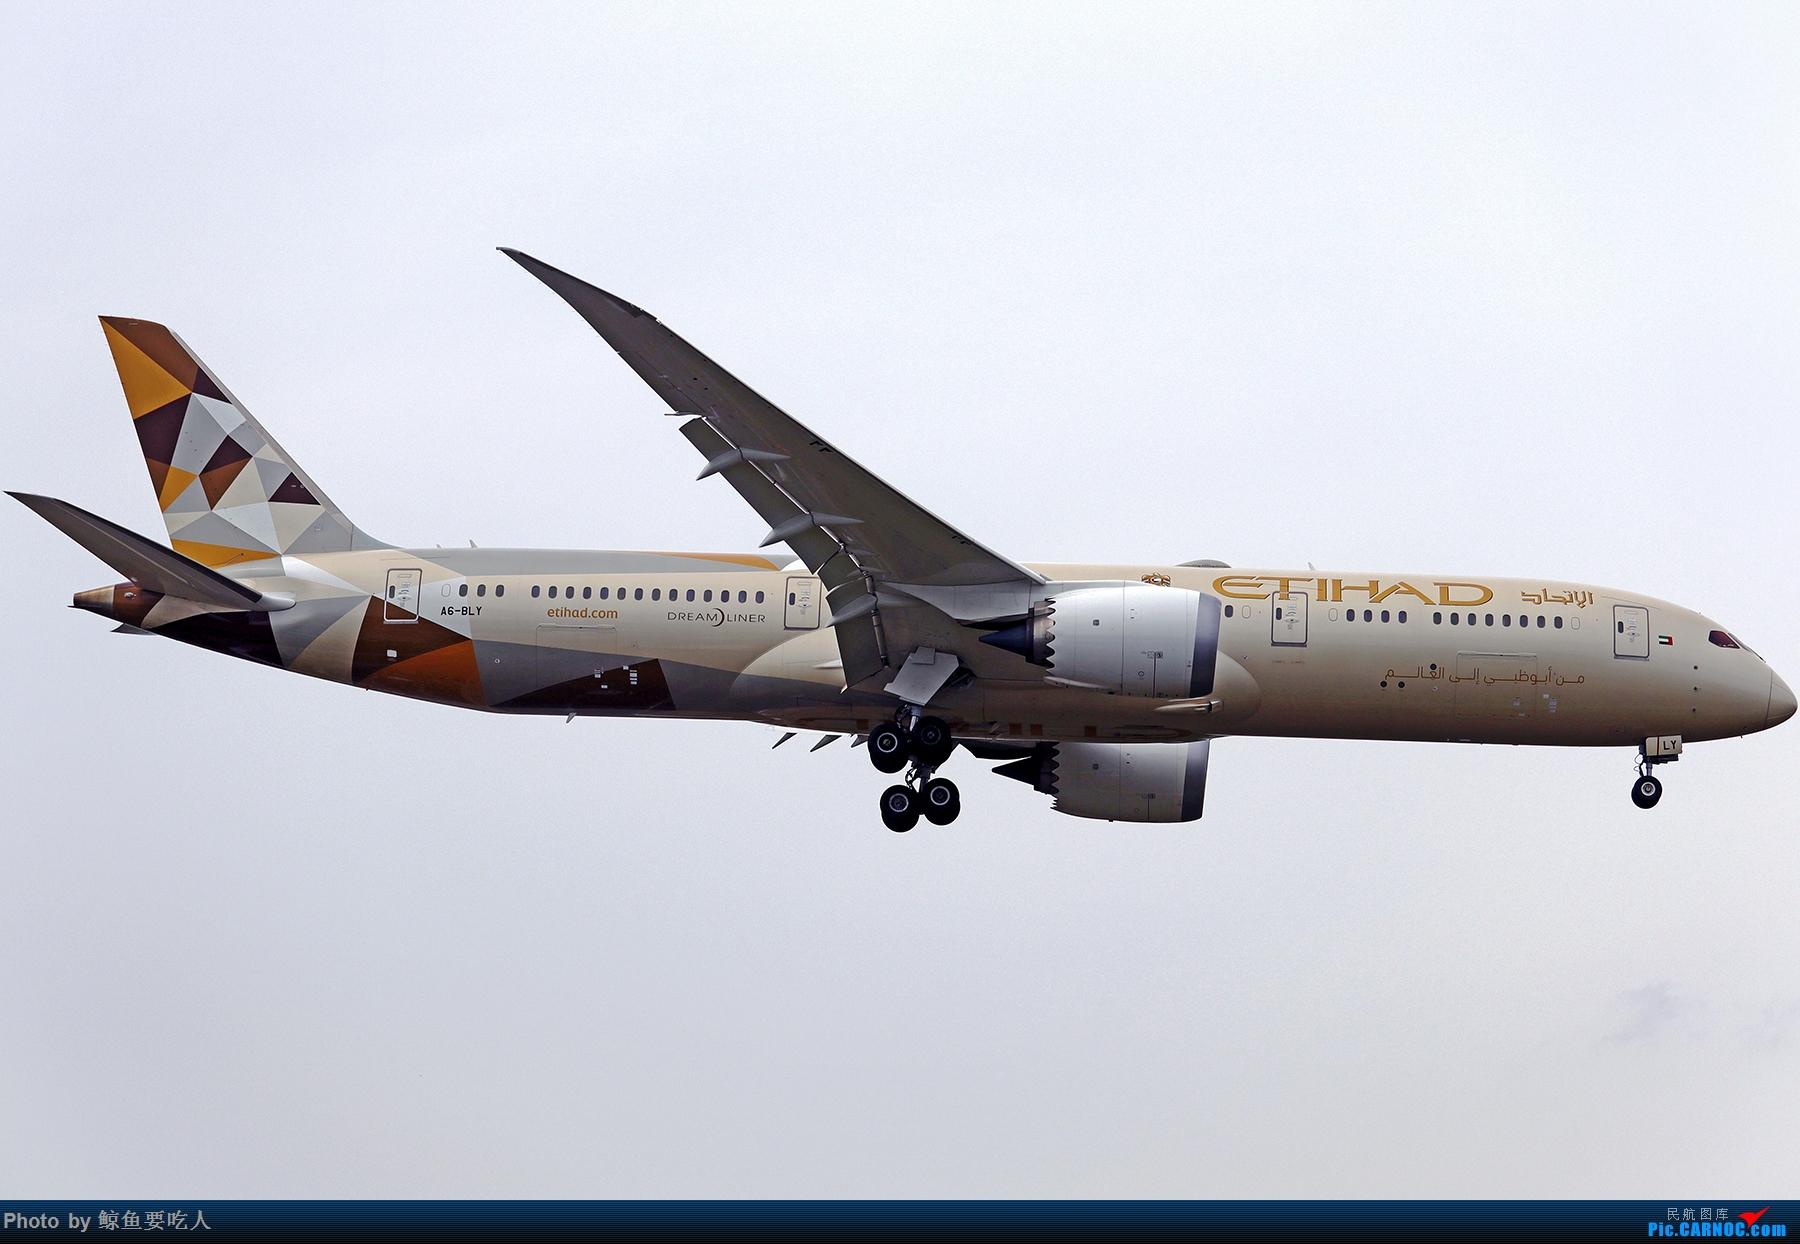 Re:[原创]【多图党】见证疫情后逐步的恢复,加拿大夏日多伦多皮尔逊机场拍机~ 乐见诸航空公司复航多伦多 BOEING 787-9 A6-BLY 多伦多皮尔逊国际机场